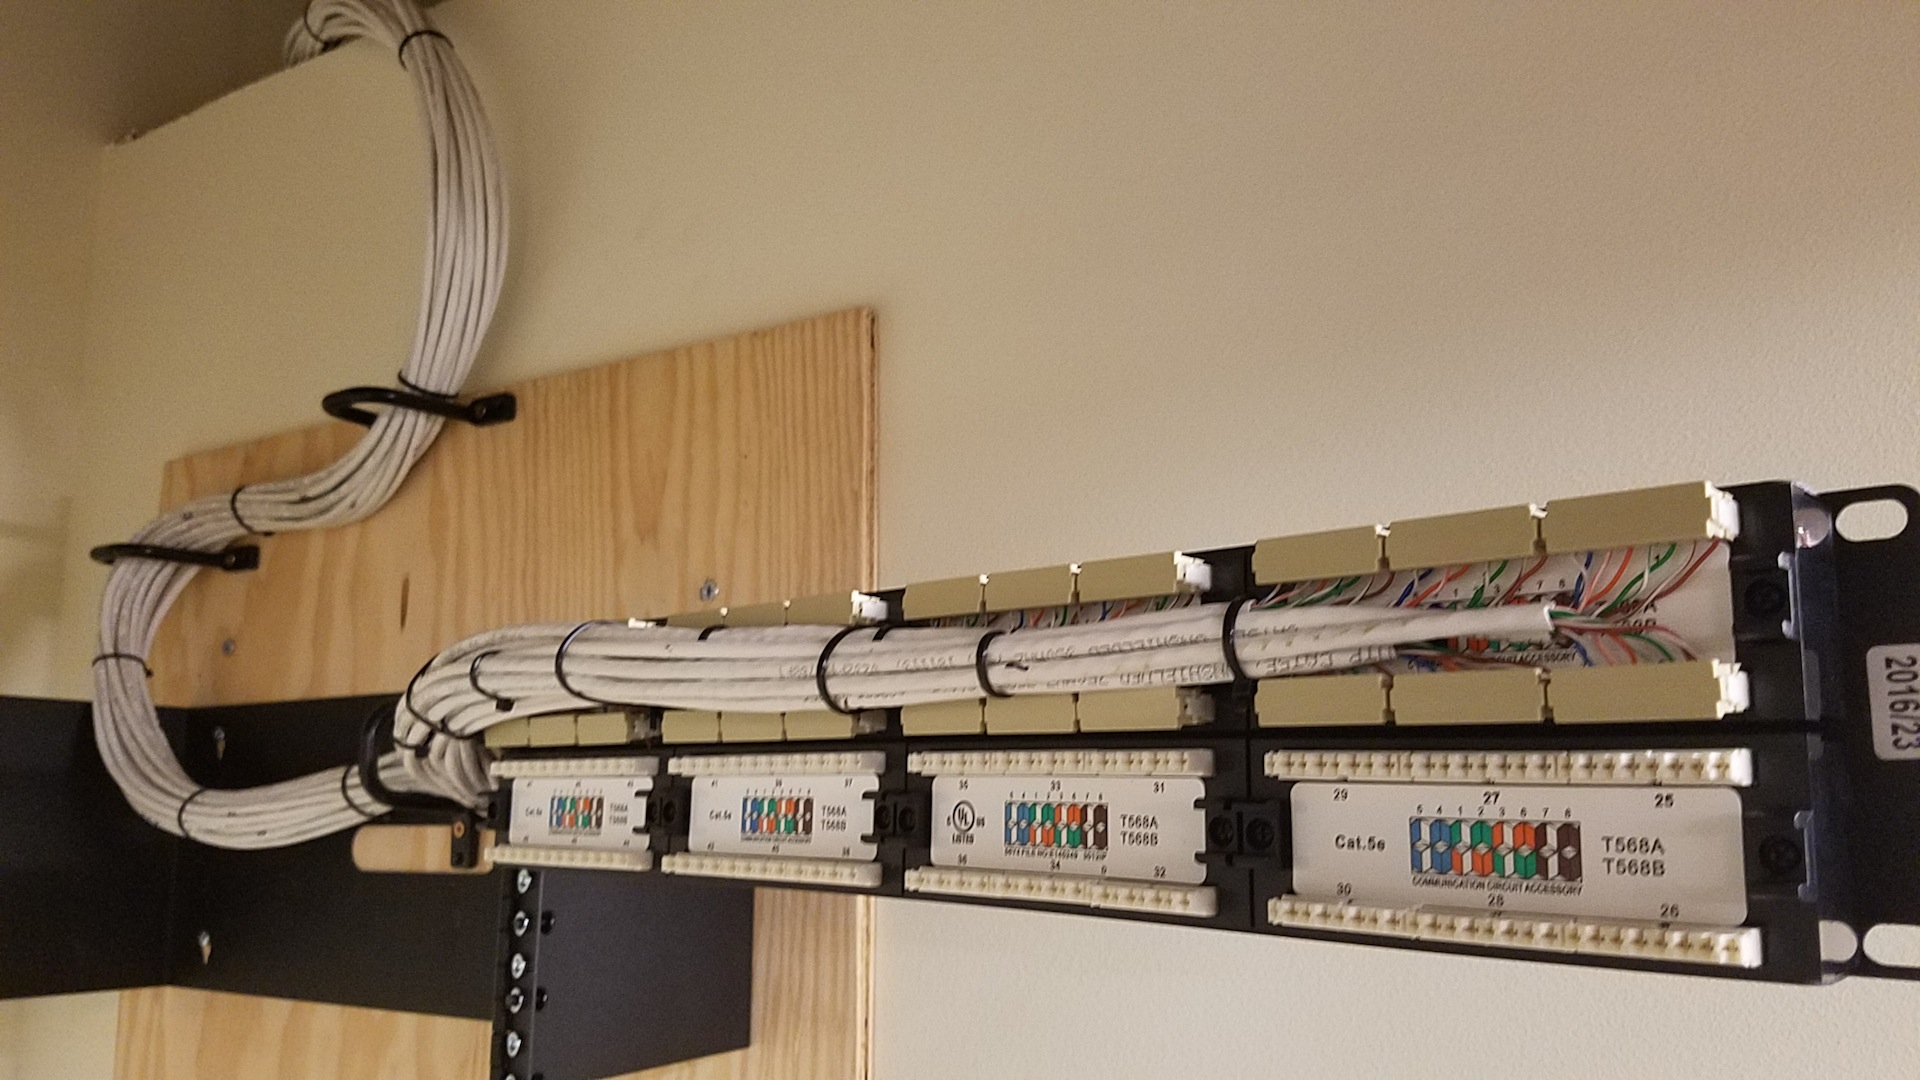 Low Voltage Wiring Audio Video Evolution Residential San Jose